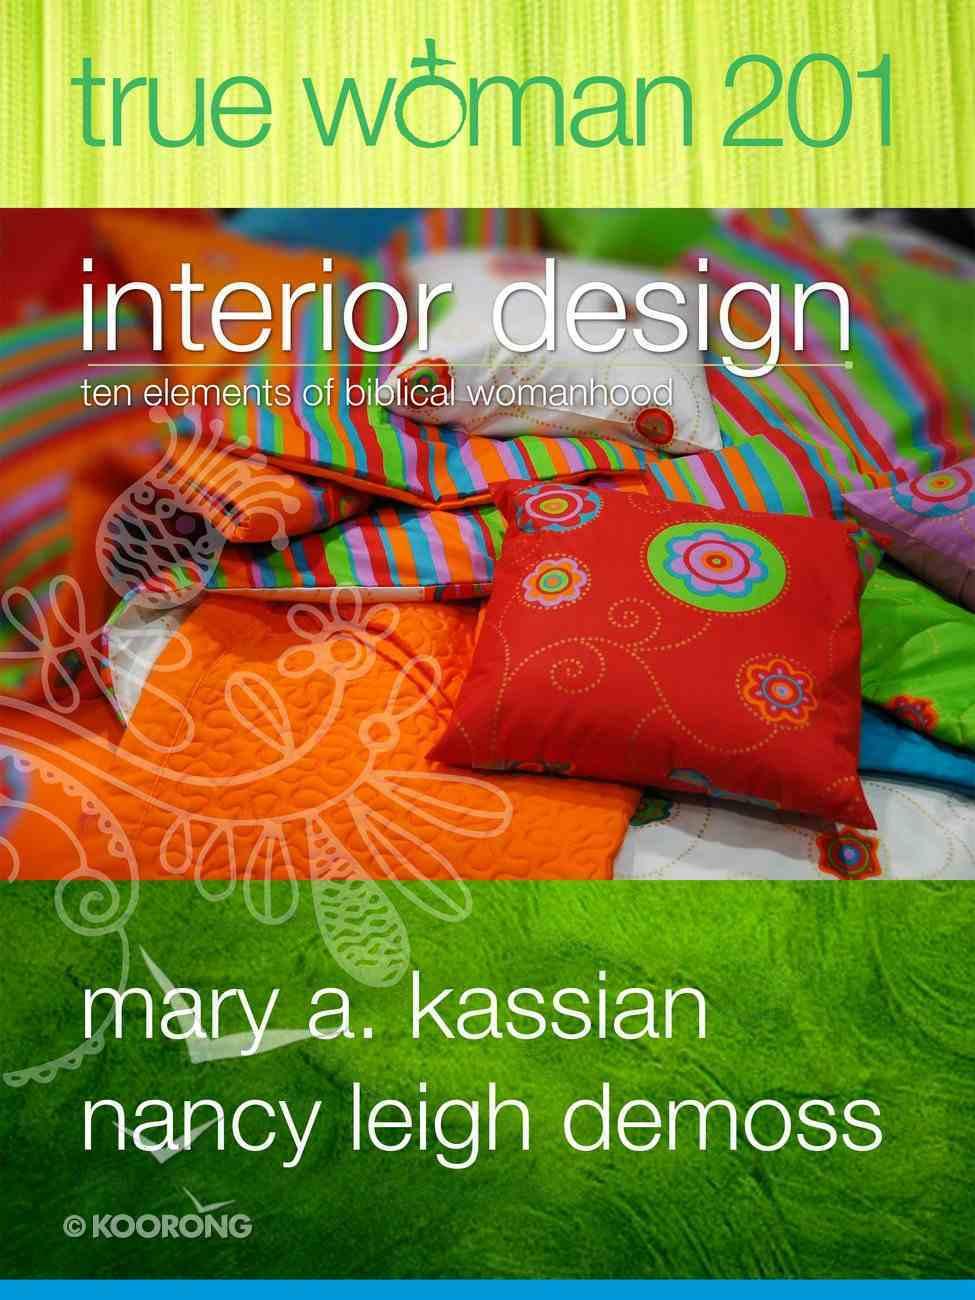 True Woman 201: Interior Design Paperback